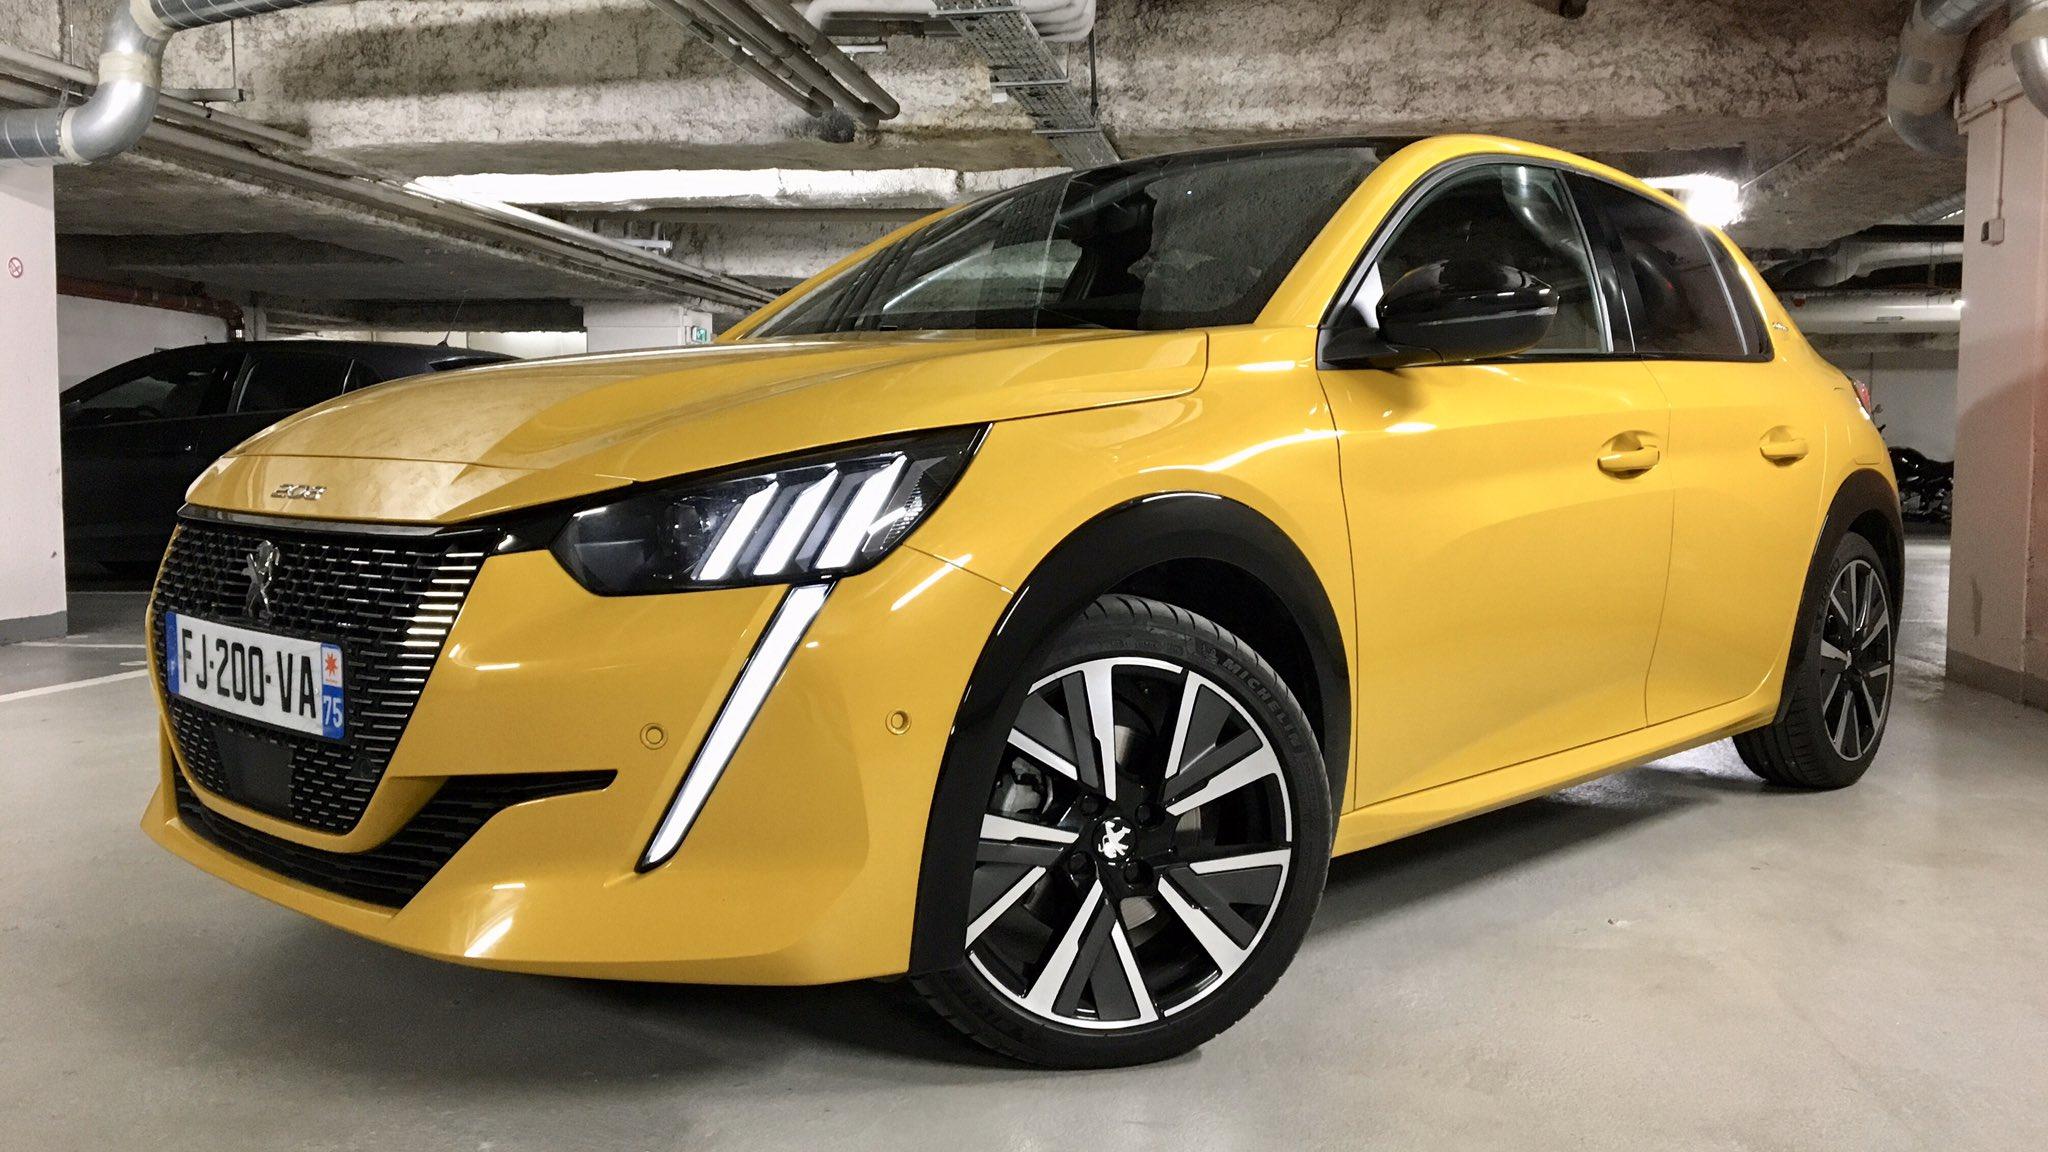 2019 - [Peugeot] 208 II (P21) - Page 11 EQlZ_lxWsAA2dNj?format=jpg&name=4096x4096